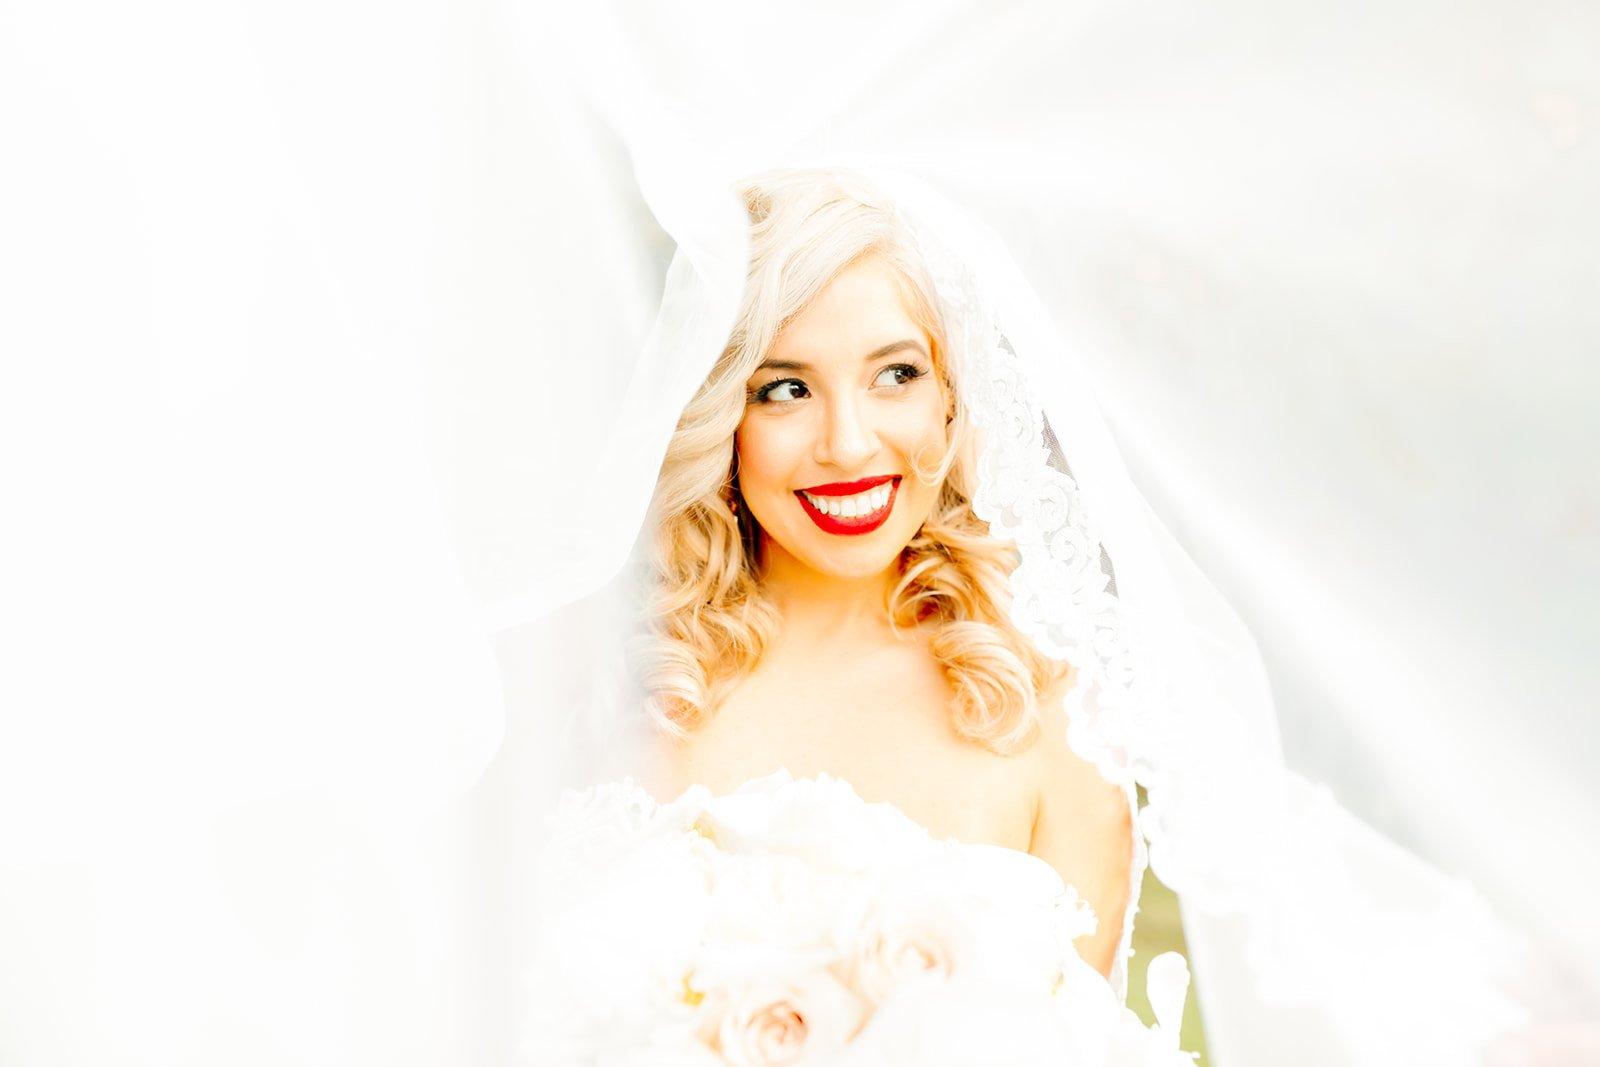 beautiful blonde bride with red lipstick under her veil